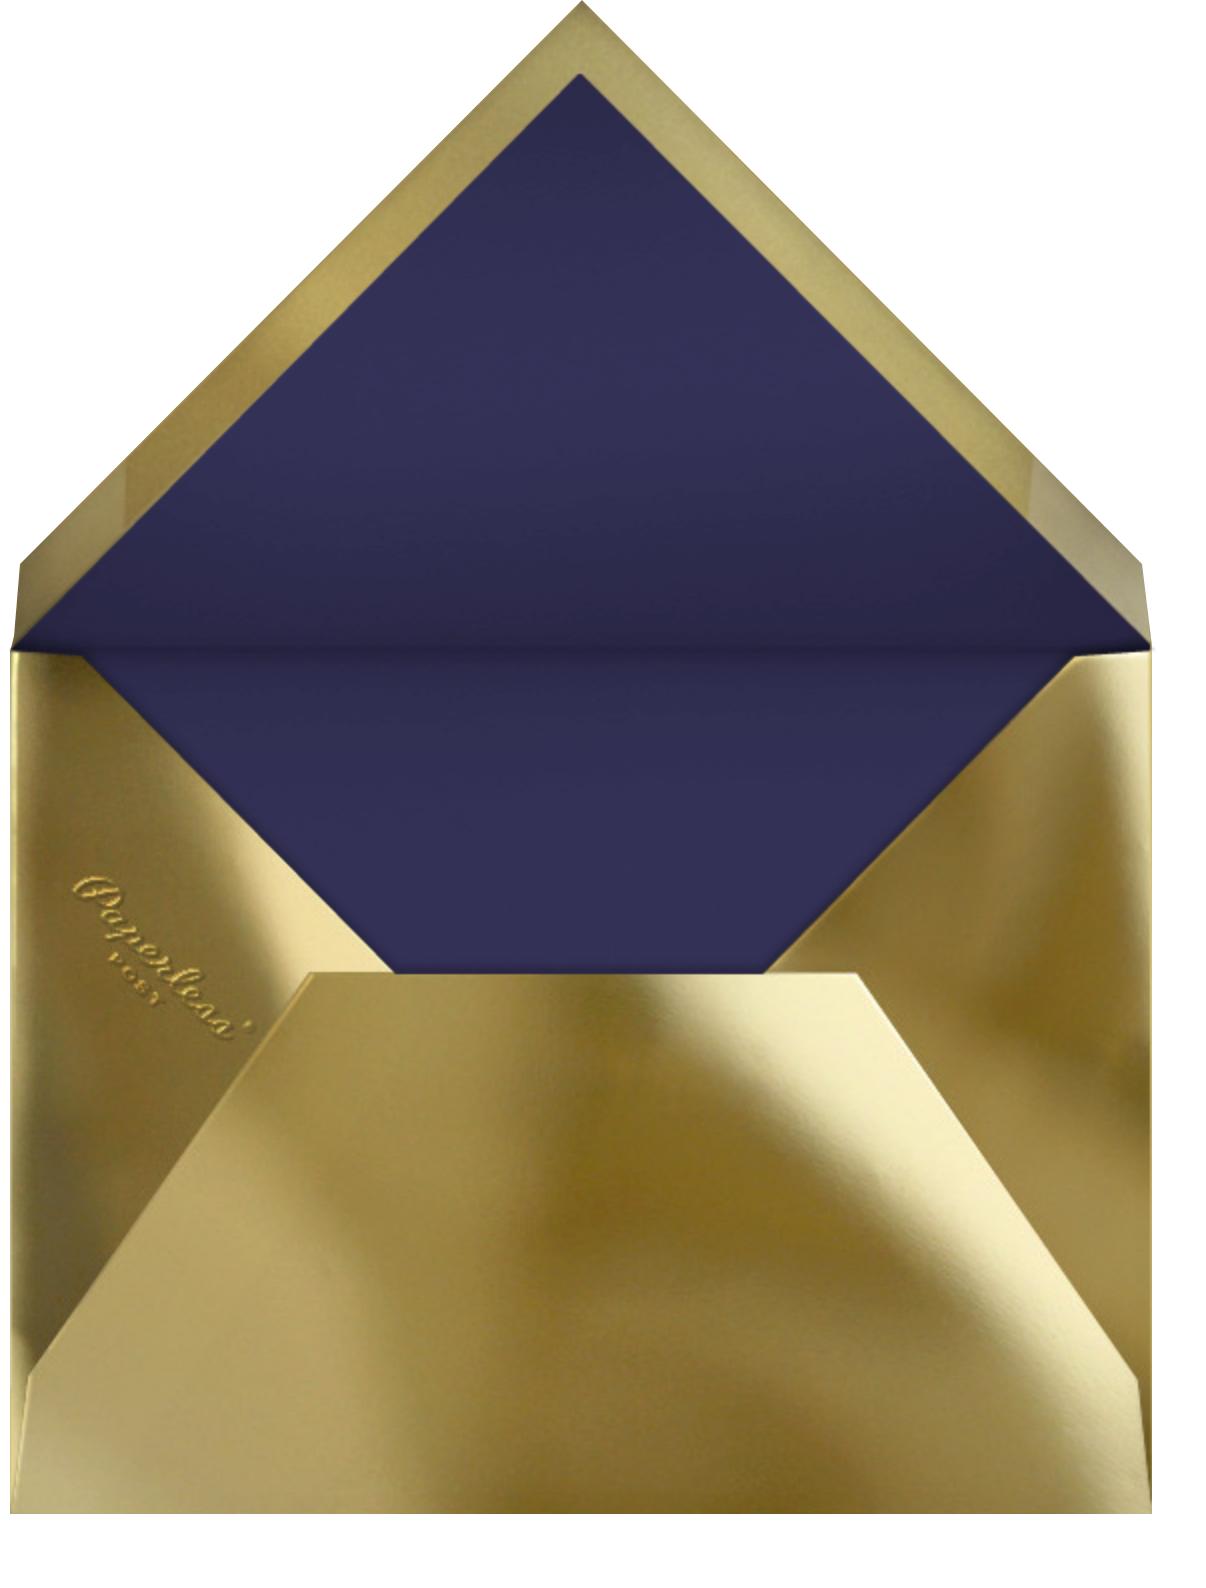 Bordure - Midnight/Gold - Paperless Post - New Year - envelope back